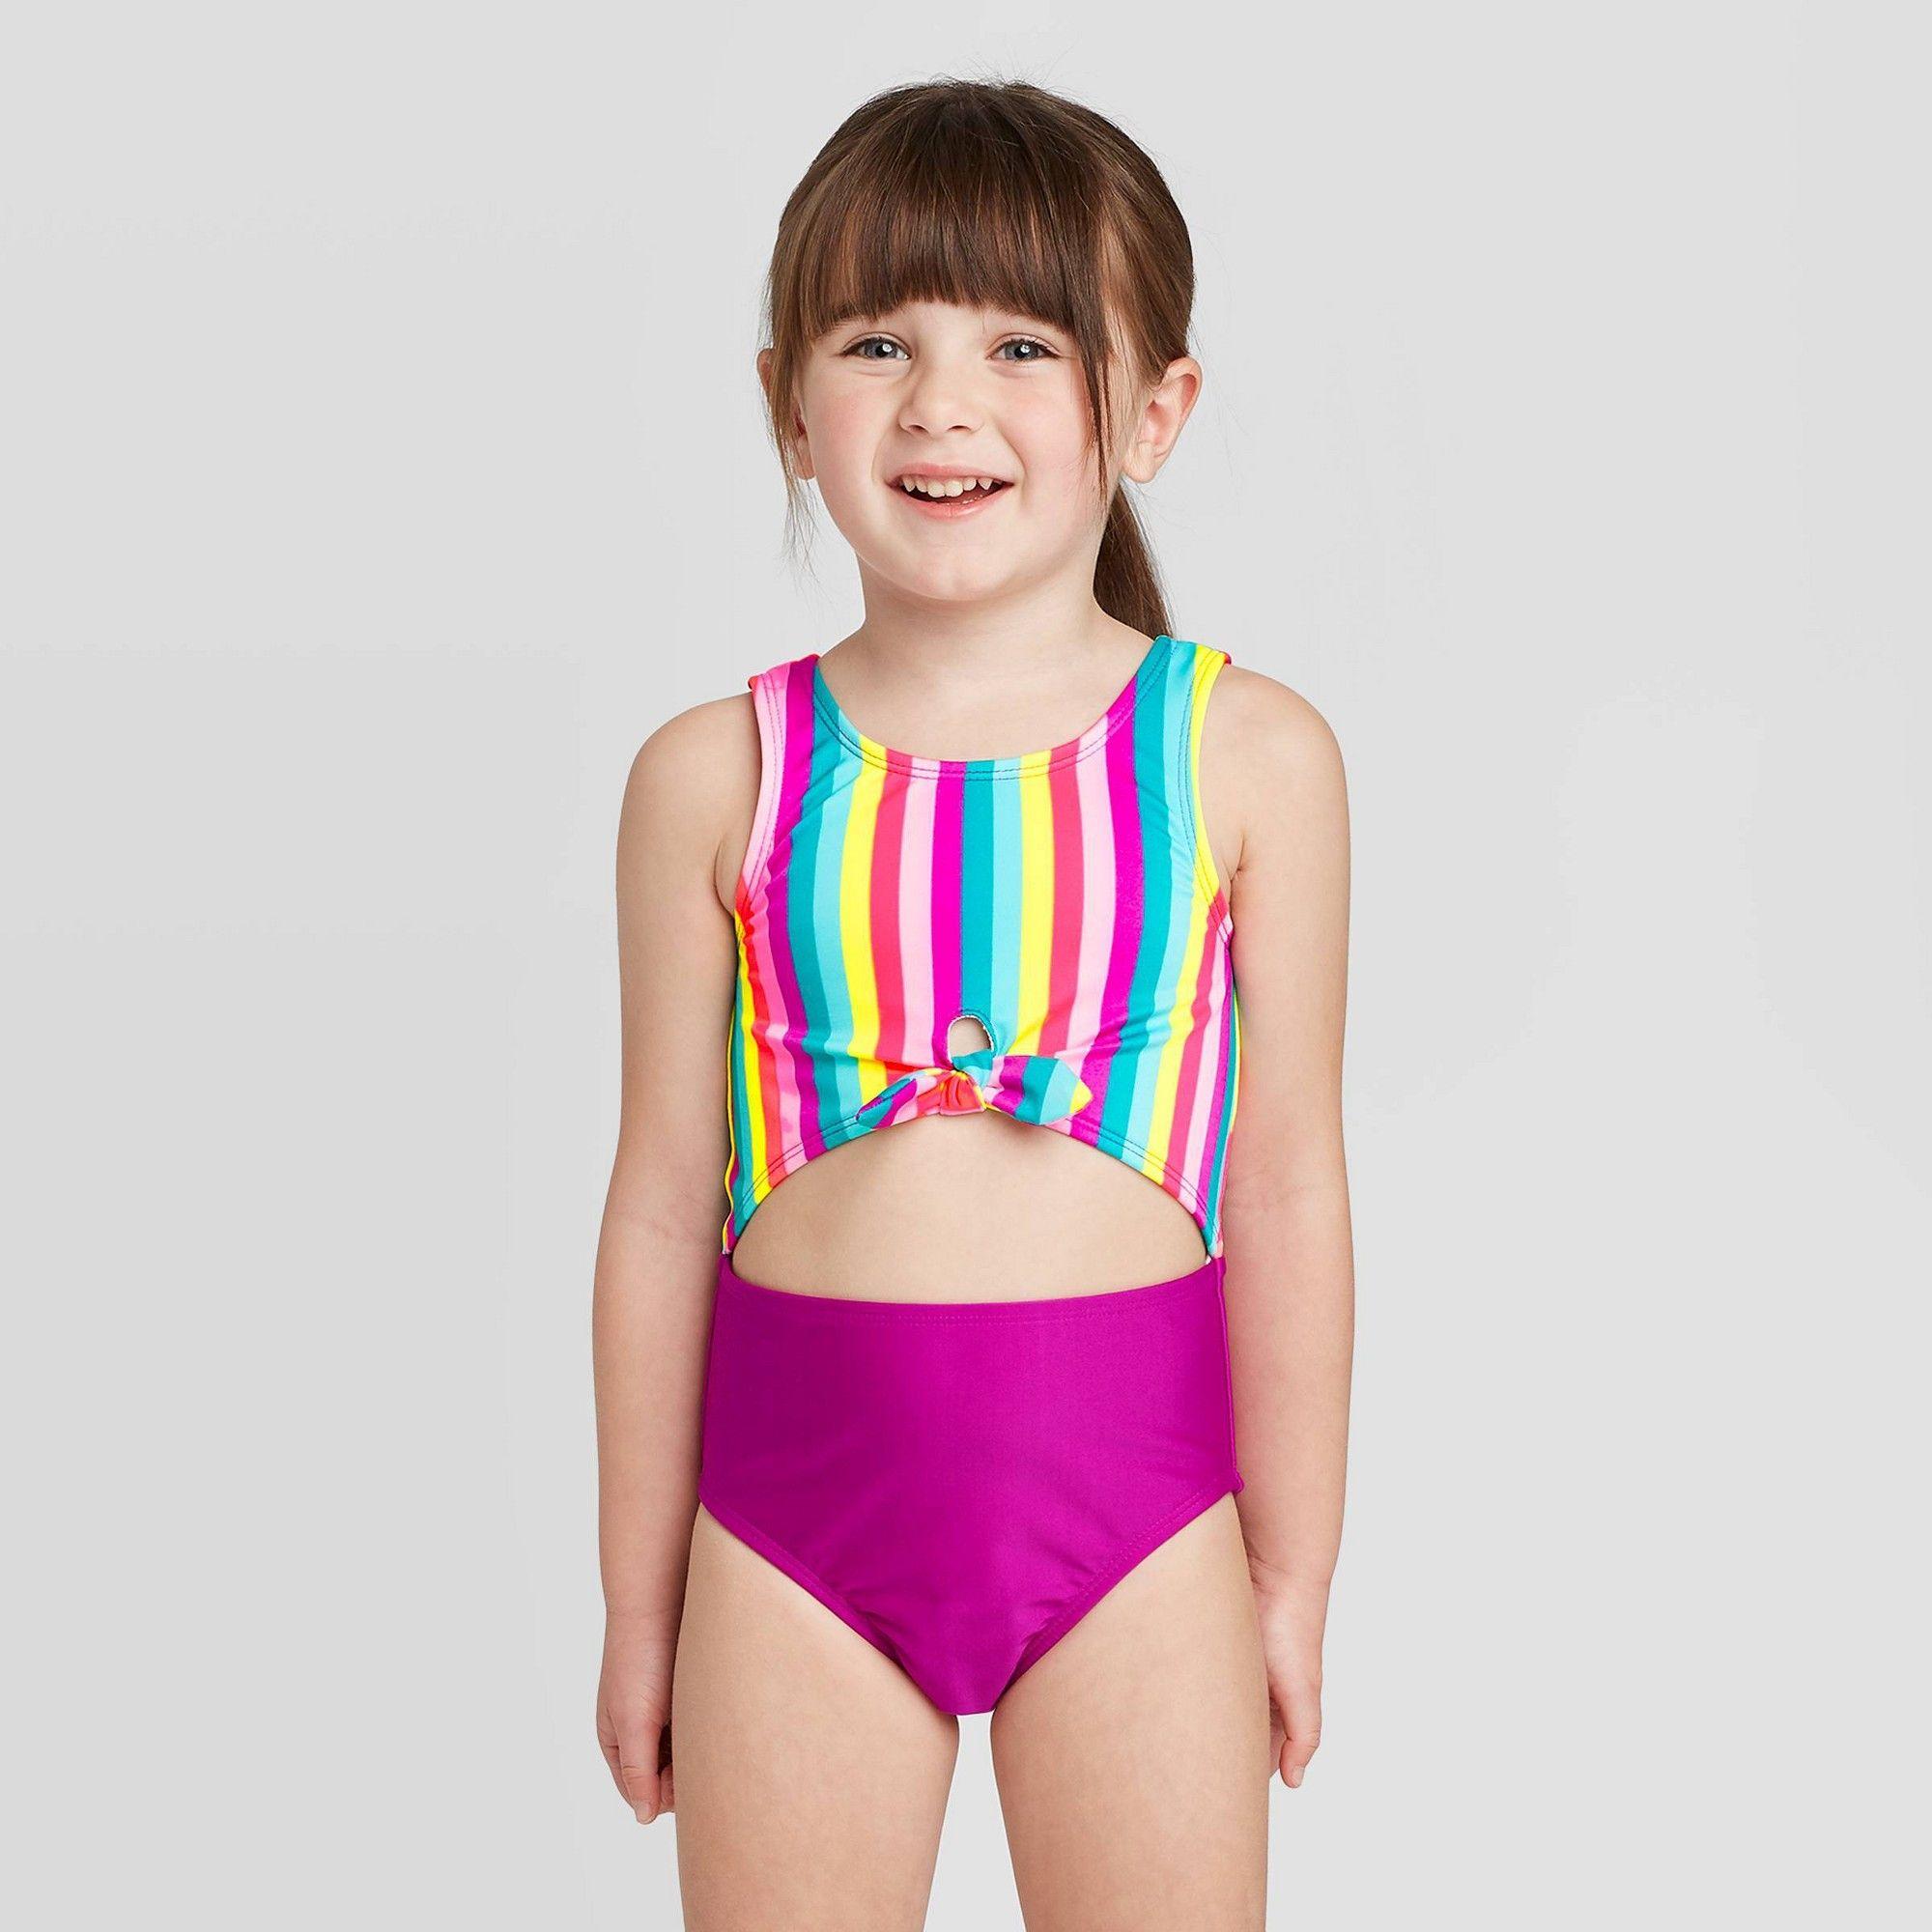 Paw Patrol Toddler Girl Pup Power Bathing Swim Suit 4T One Piece New UPF 50